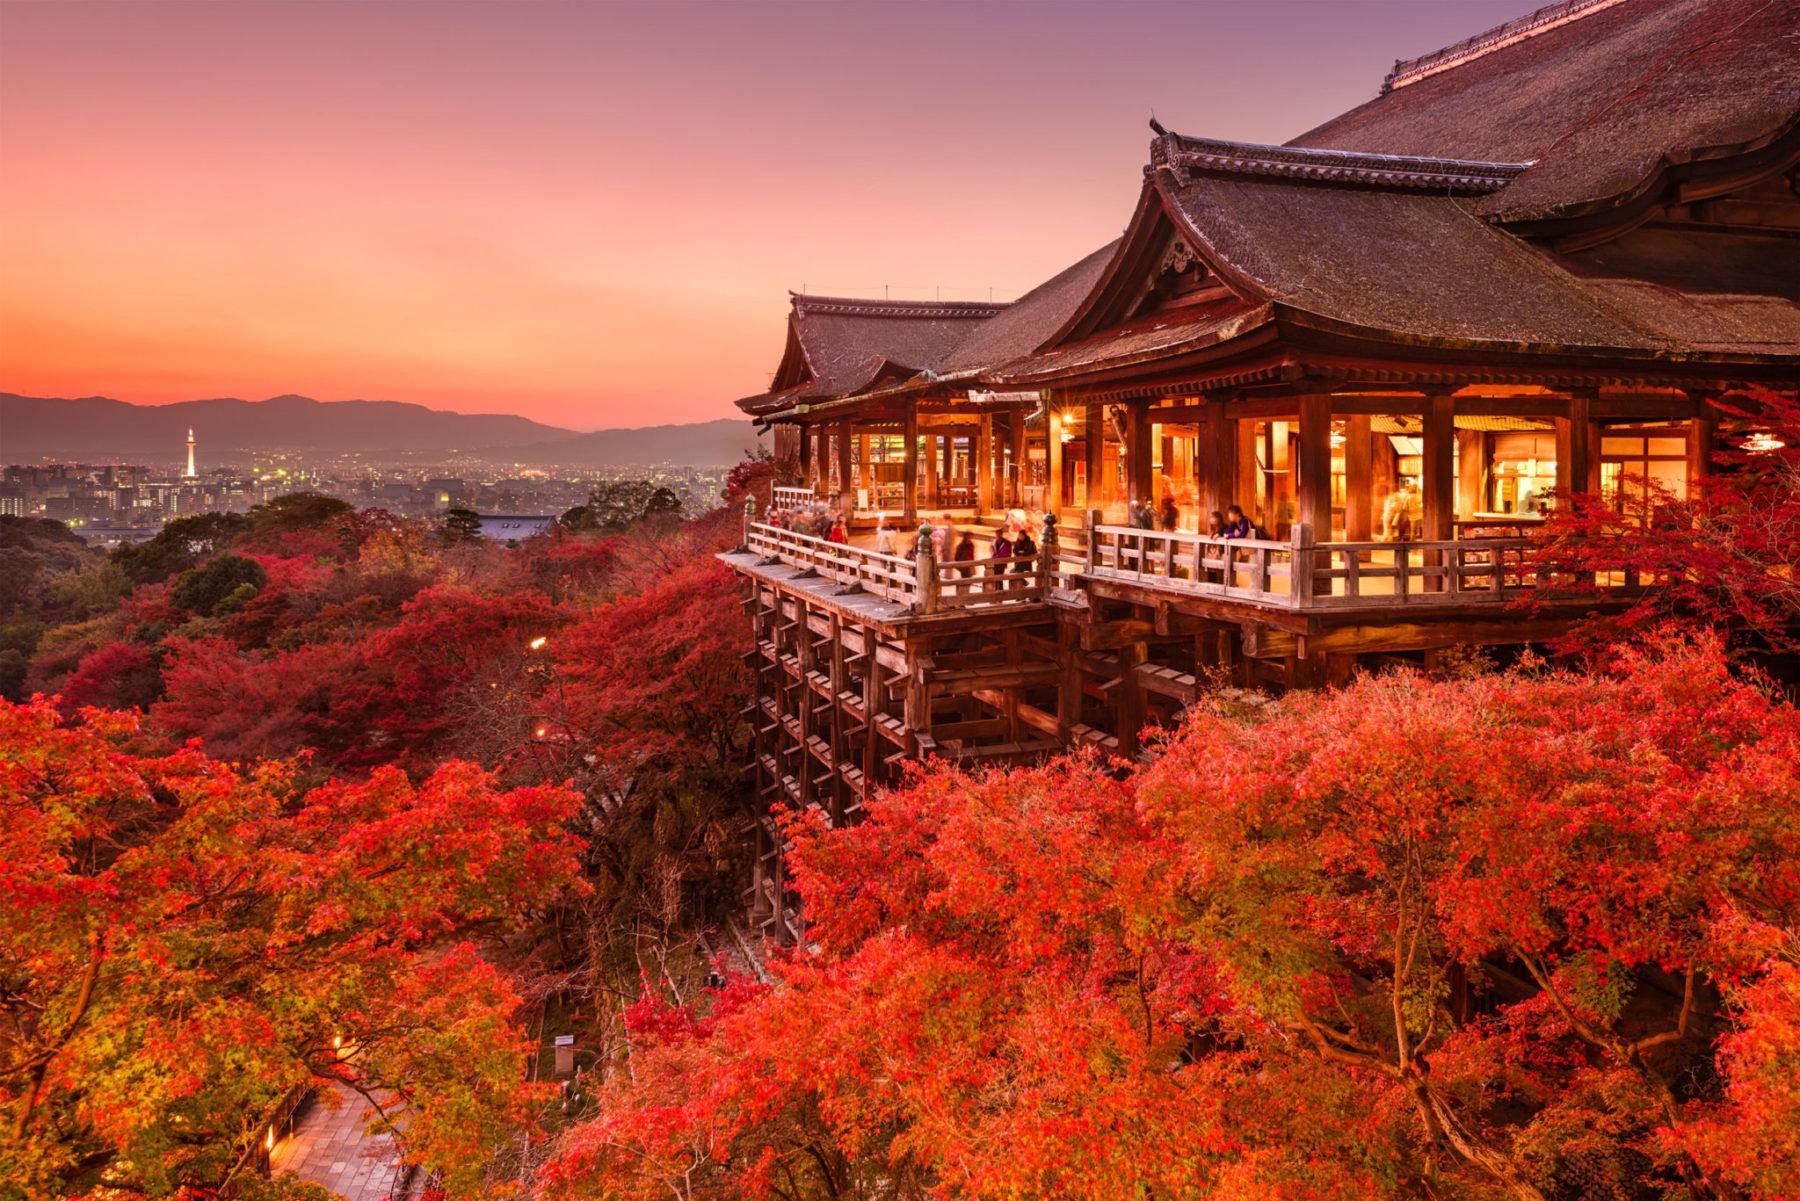 kyoto e1517522369472 - Magnificent Japan